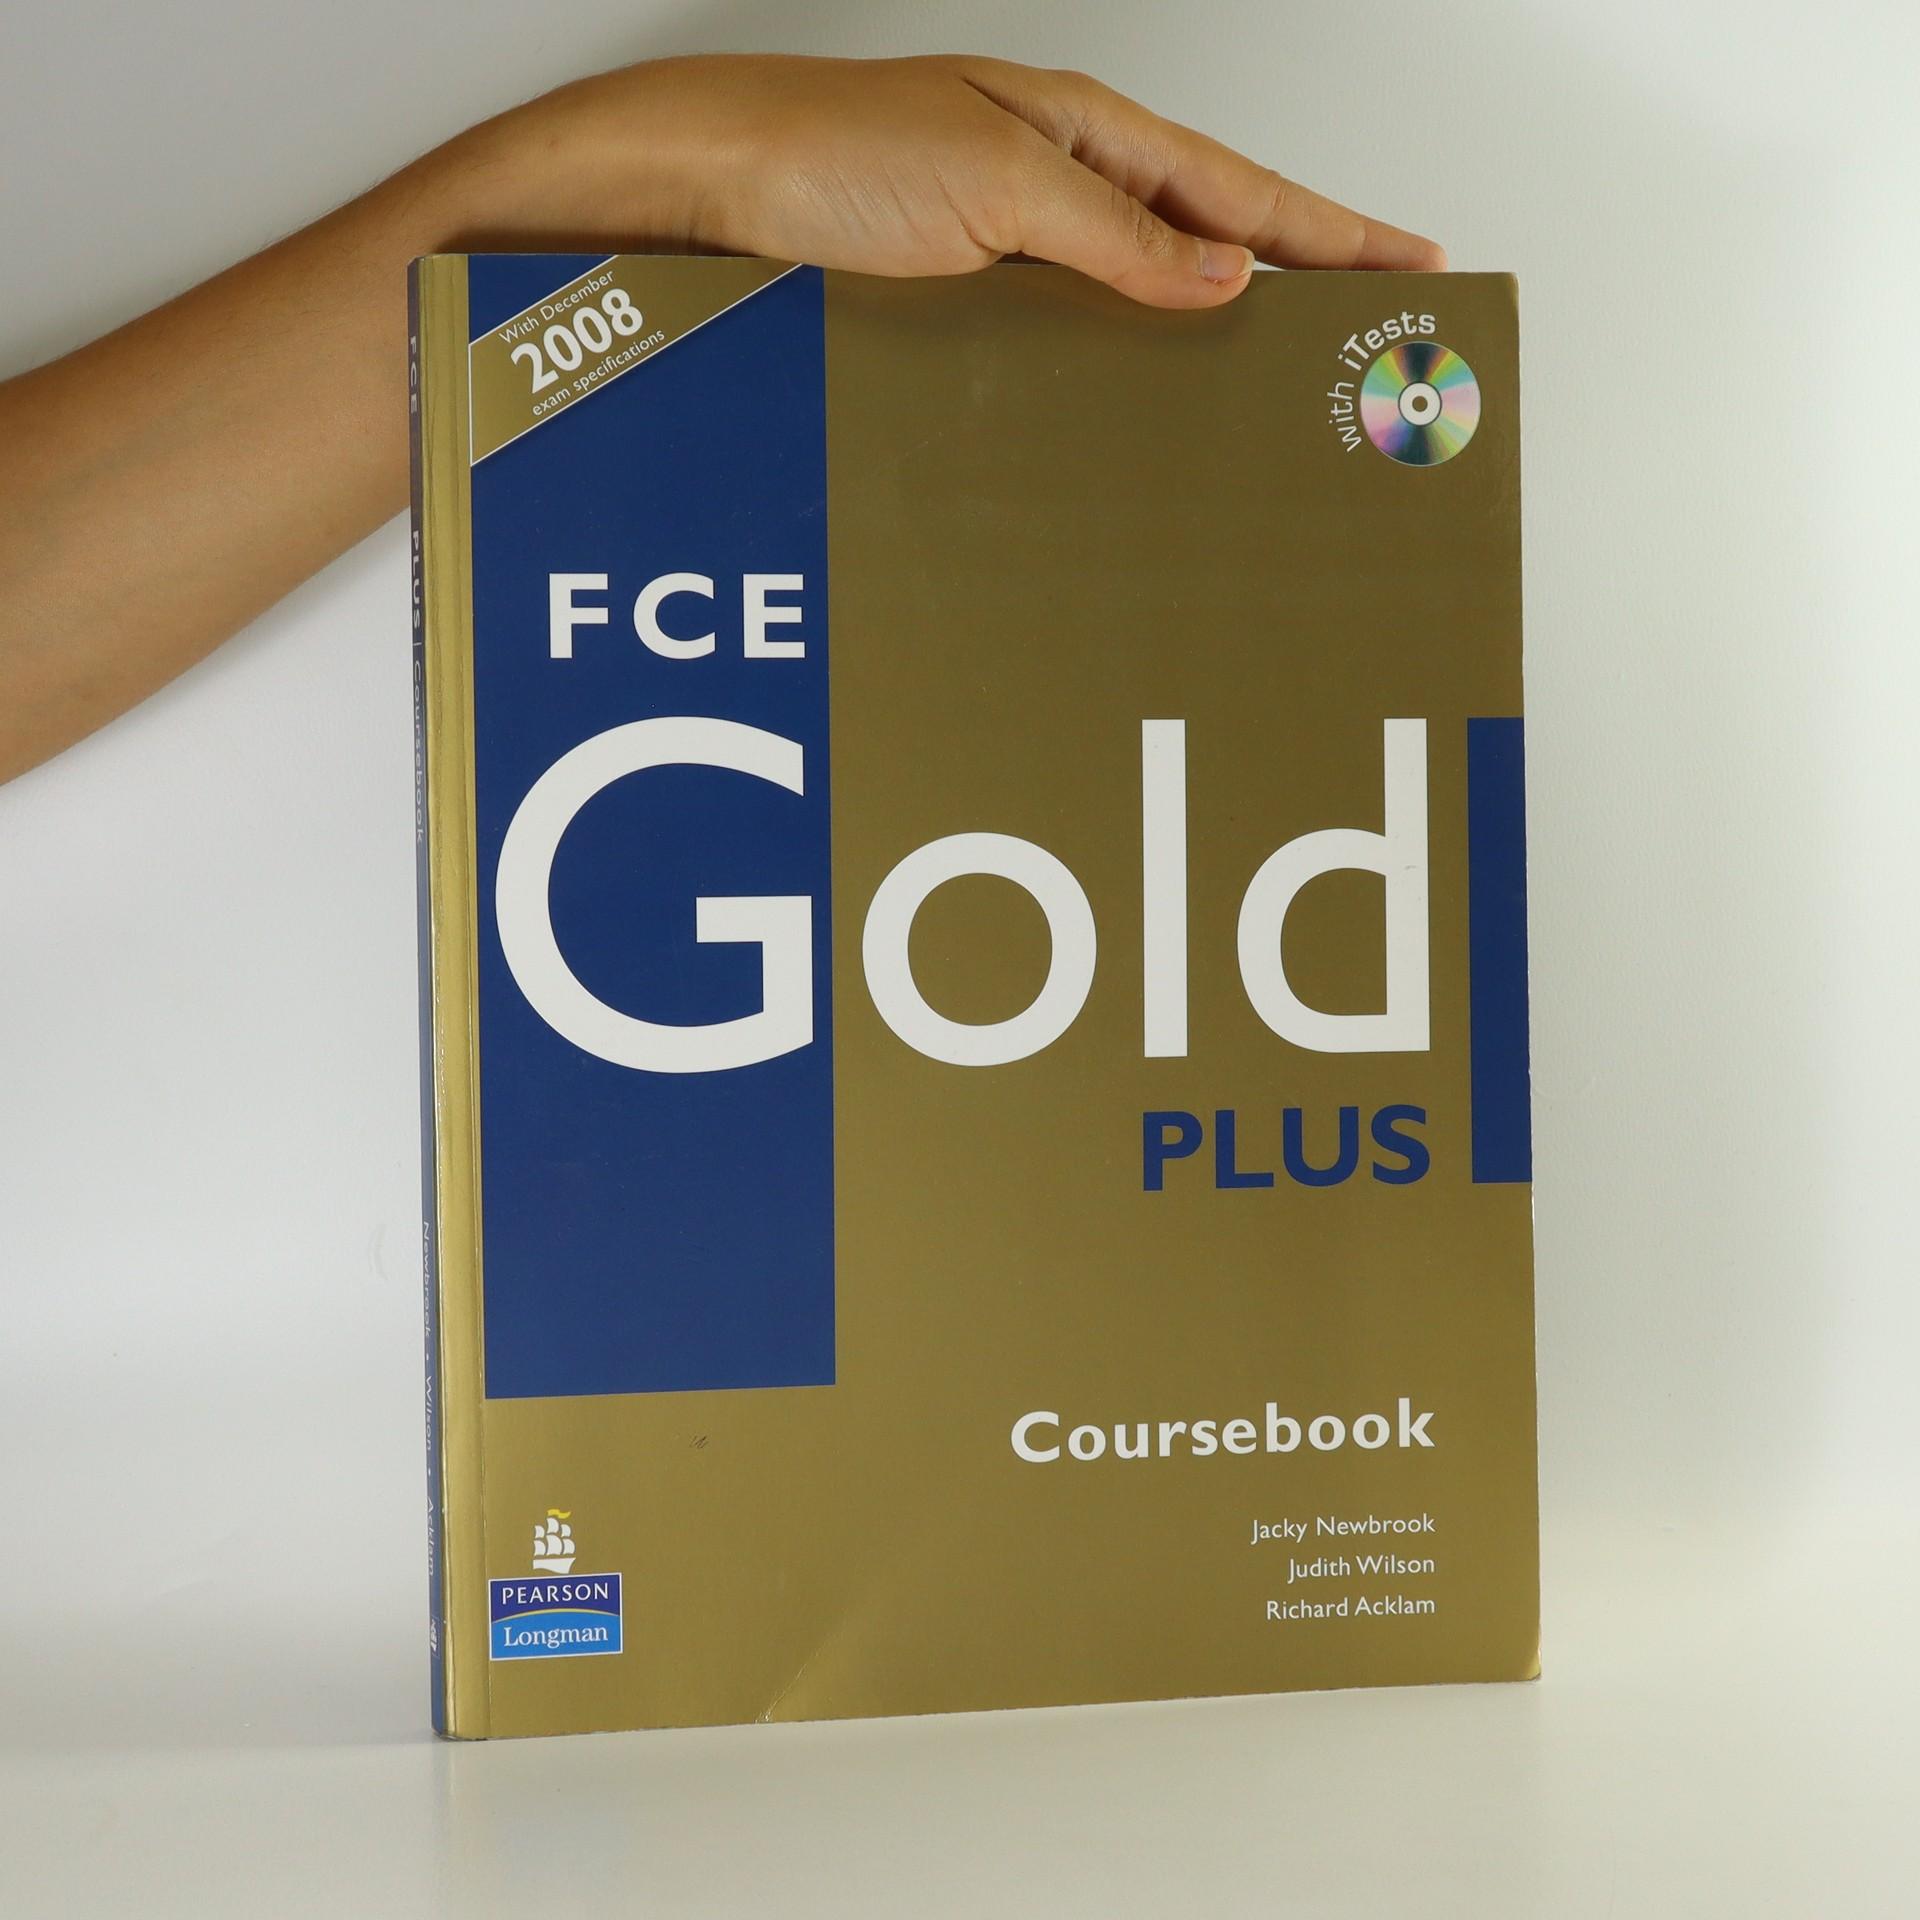 antikvární kniha FCE Gold Plus. Coursebook (bez CD), 2004